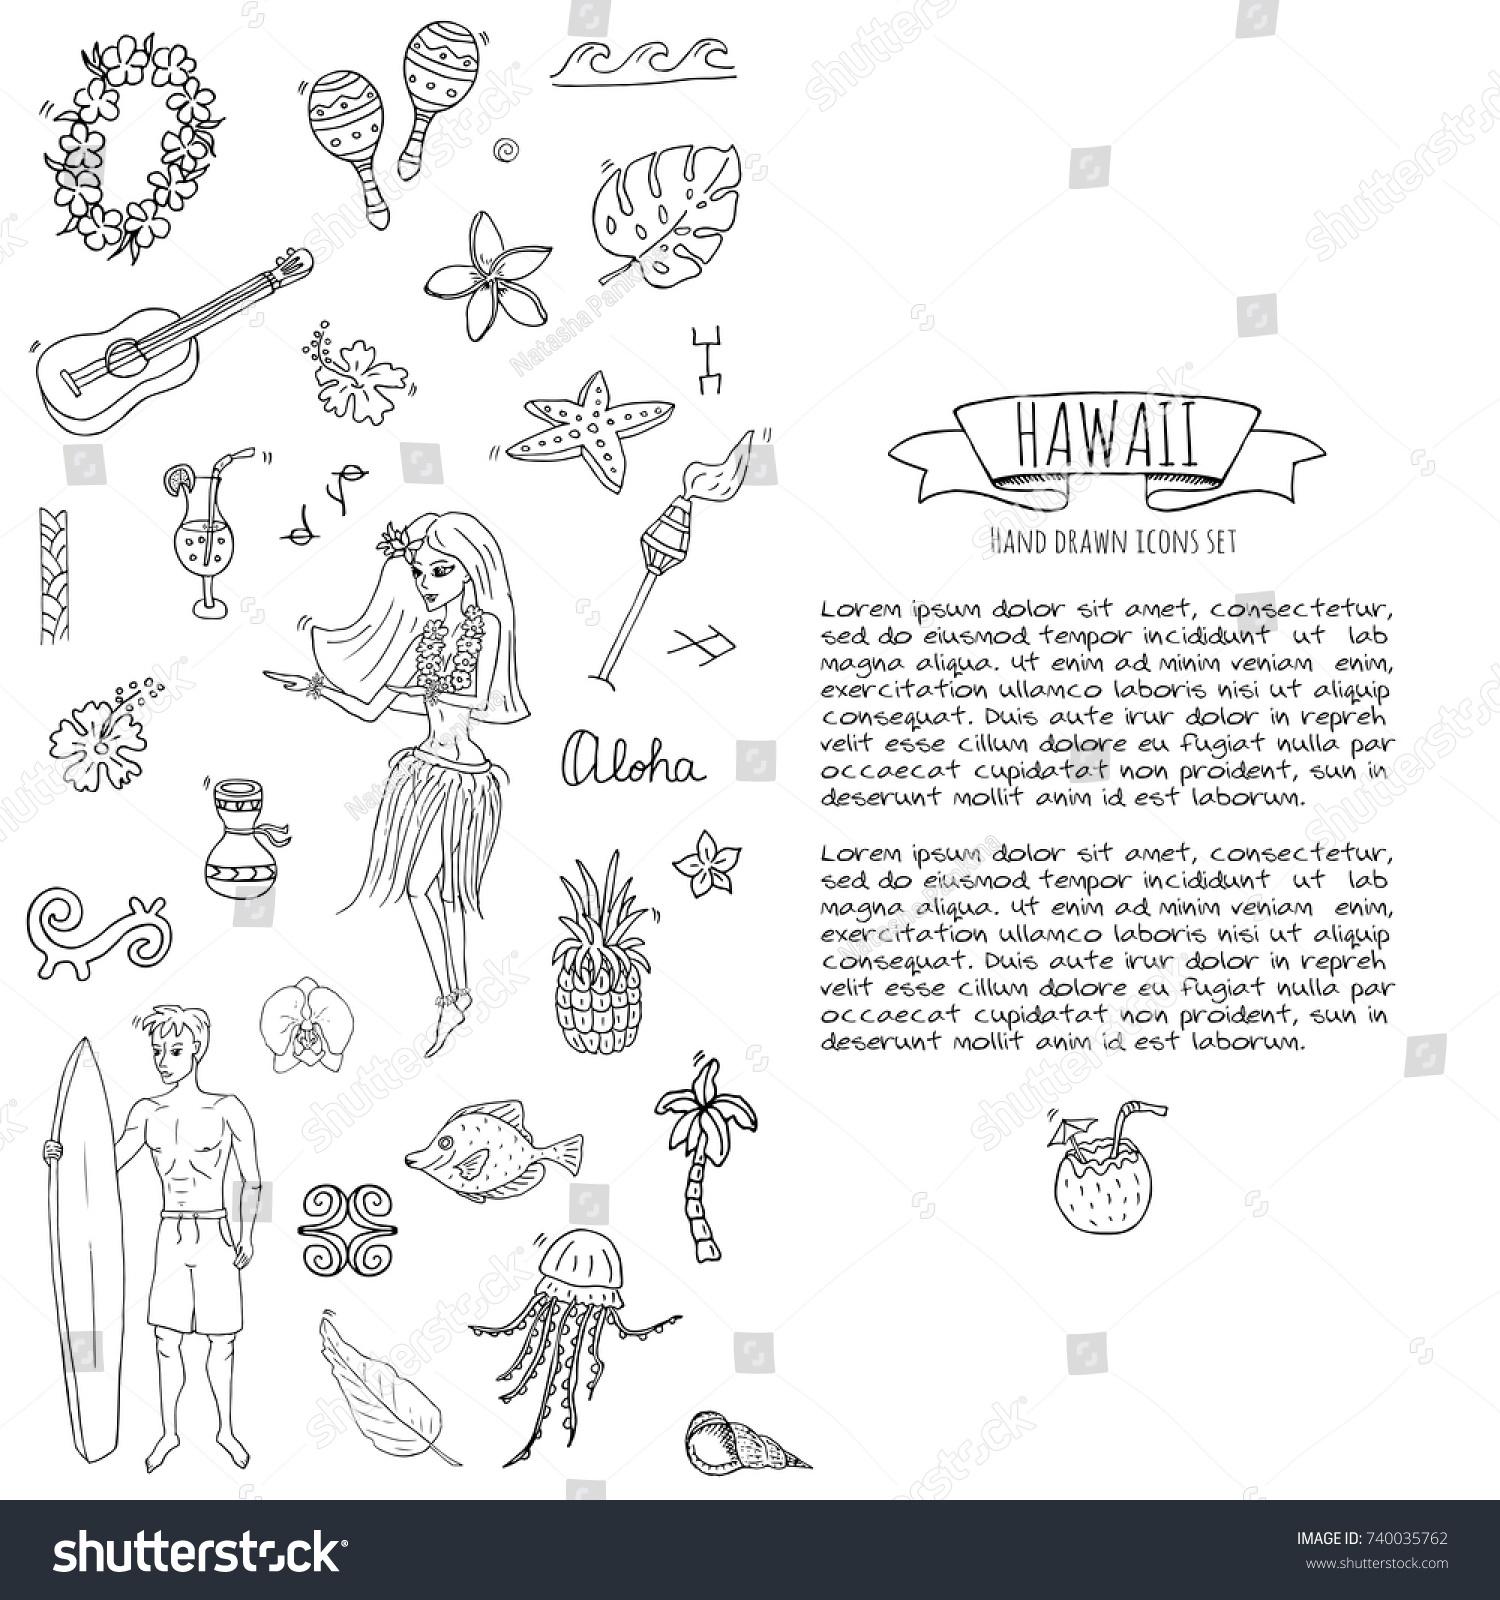 Hand Drawn Doodle Hawaii Icons Set Stock Vector Royalty Free